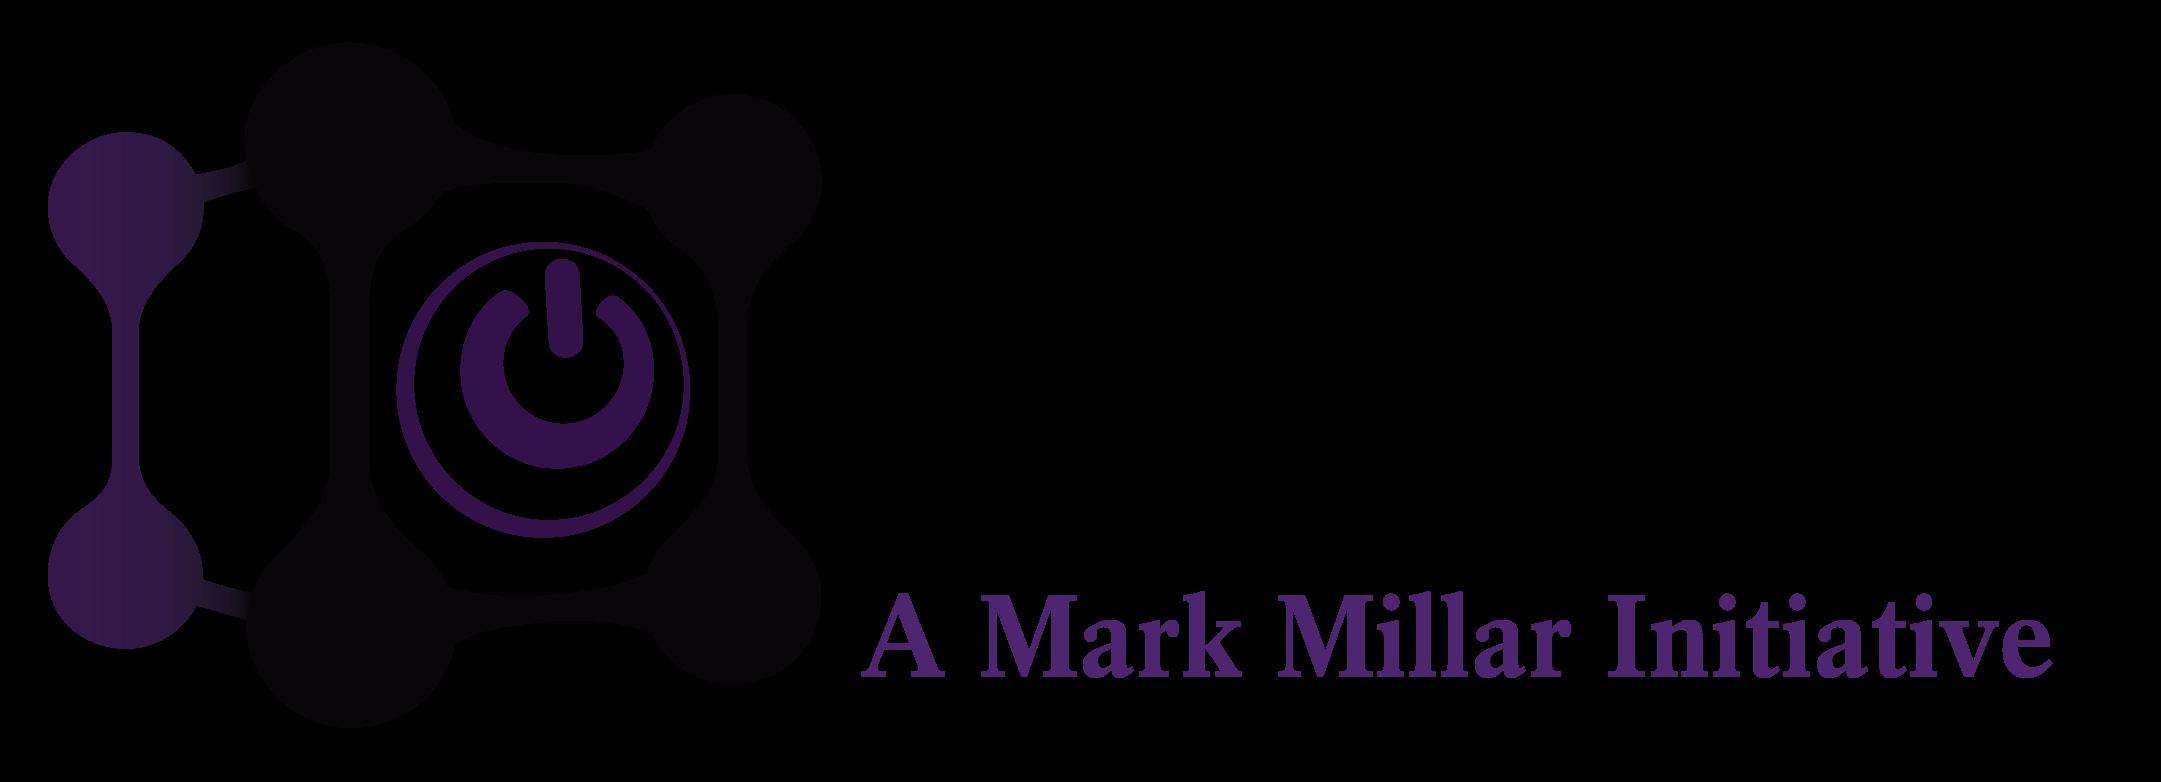 SCLP_a-MM-initiative_Logo_transparent.png